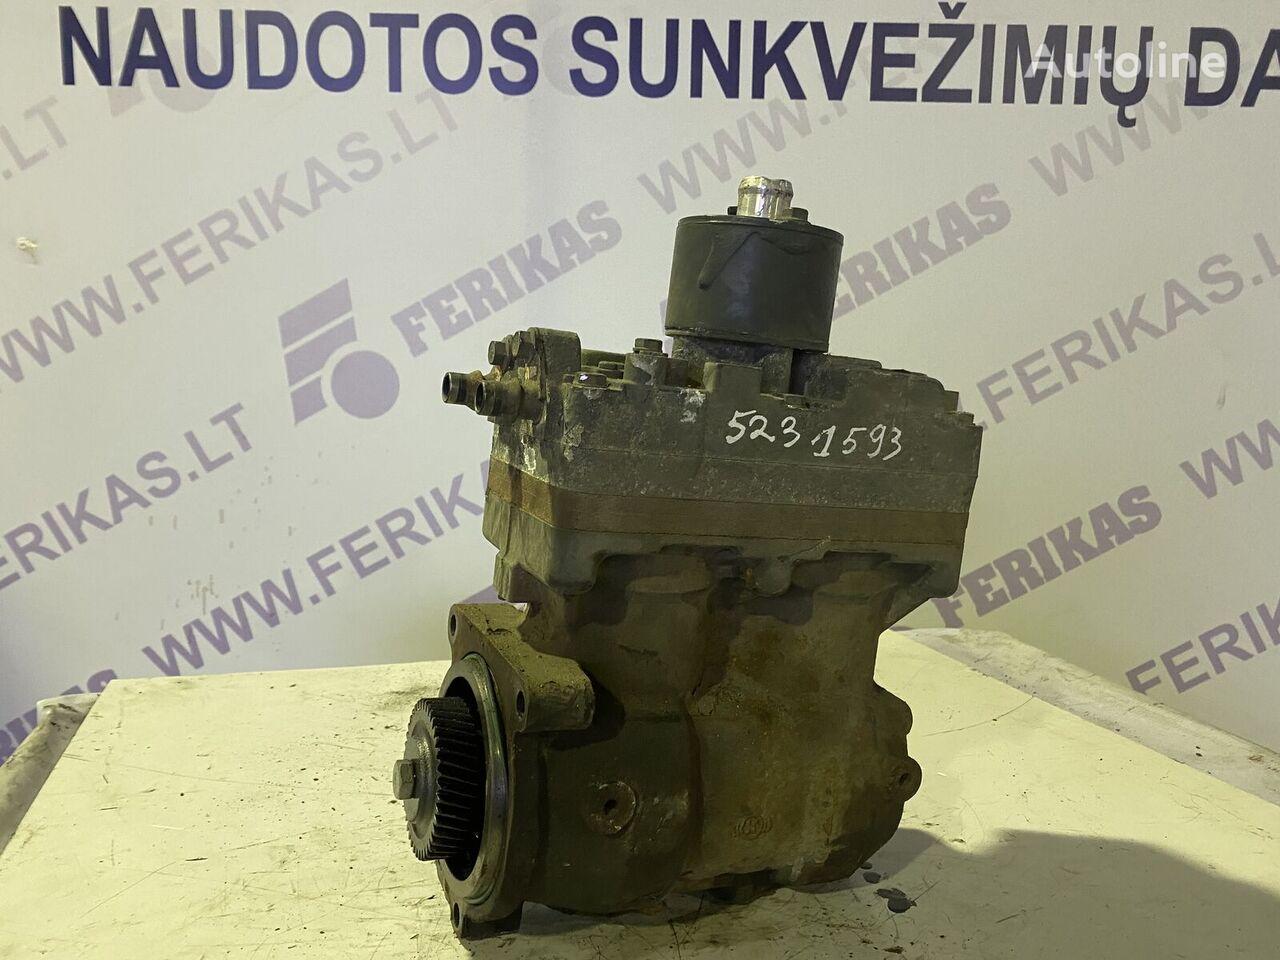 SCANIA R air compressor 2024413 570972 (2024413 570972) pneumatic compressor for tractor unit